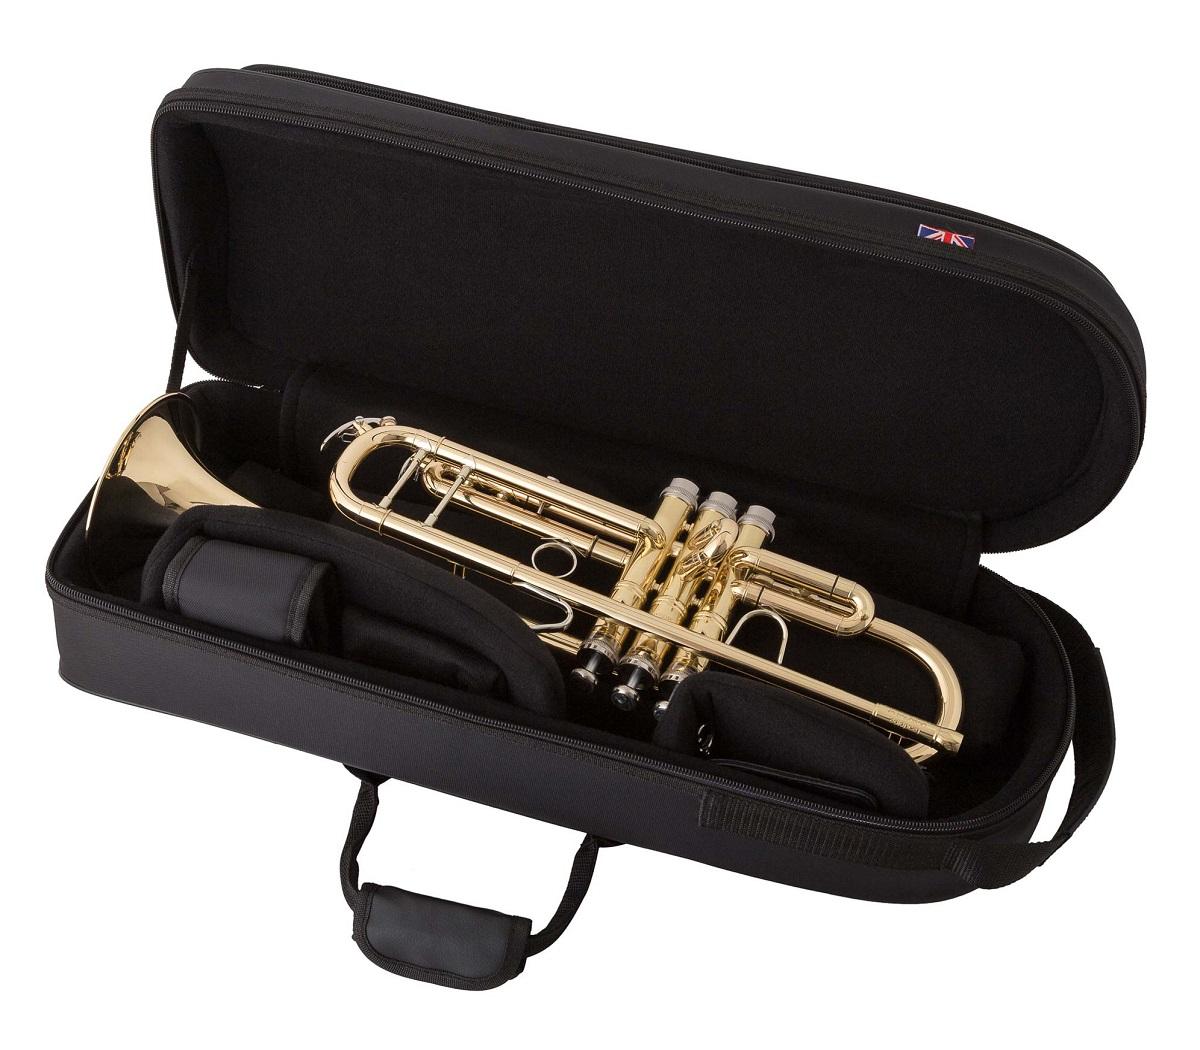 jp pro single trumpet case jp855 duchy brass instruments for sale. Black Bedroom Furniture Sets. Home Design Ideas